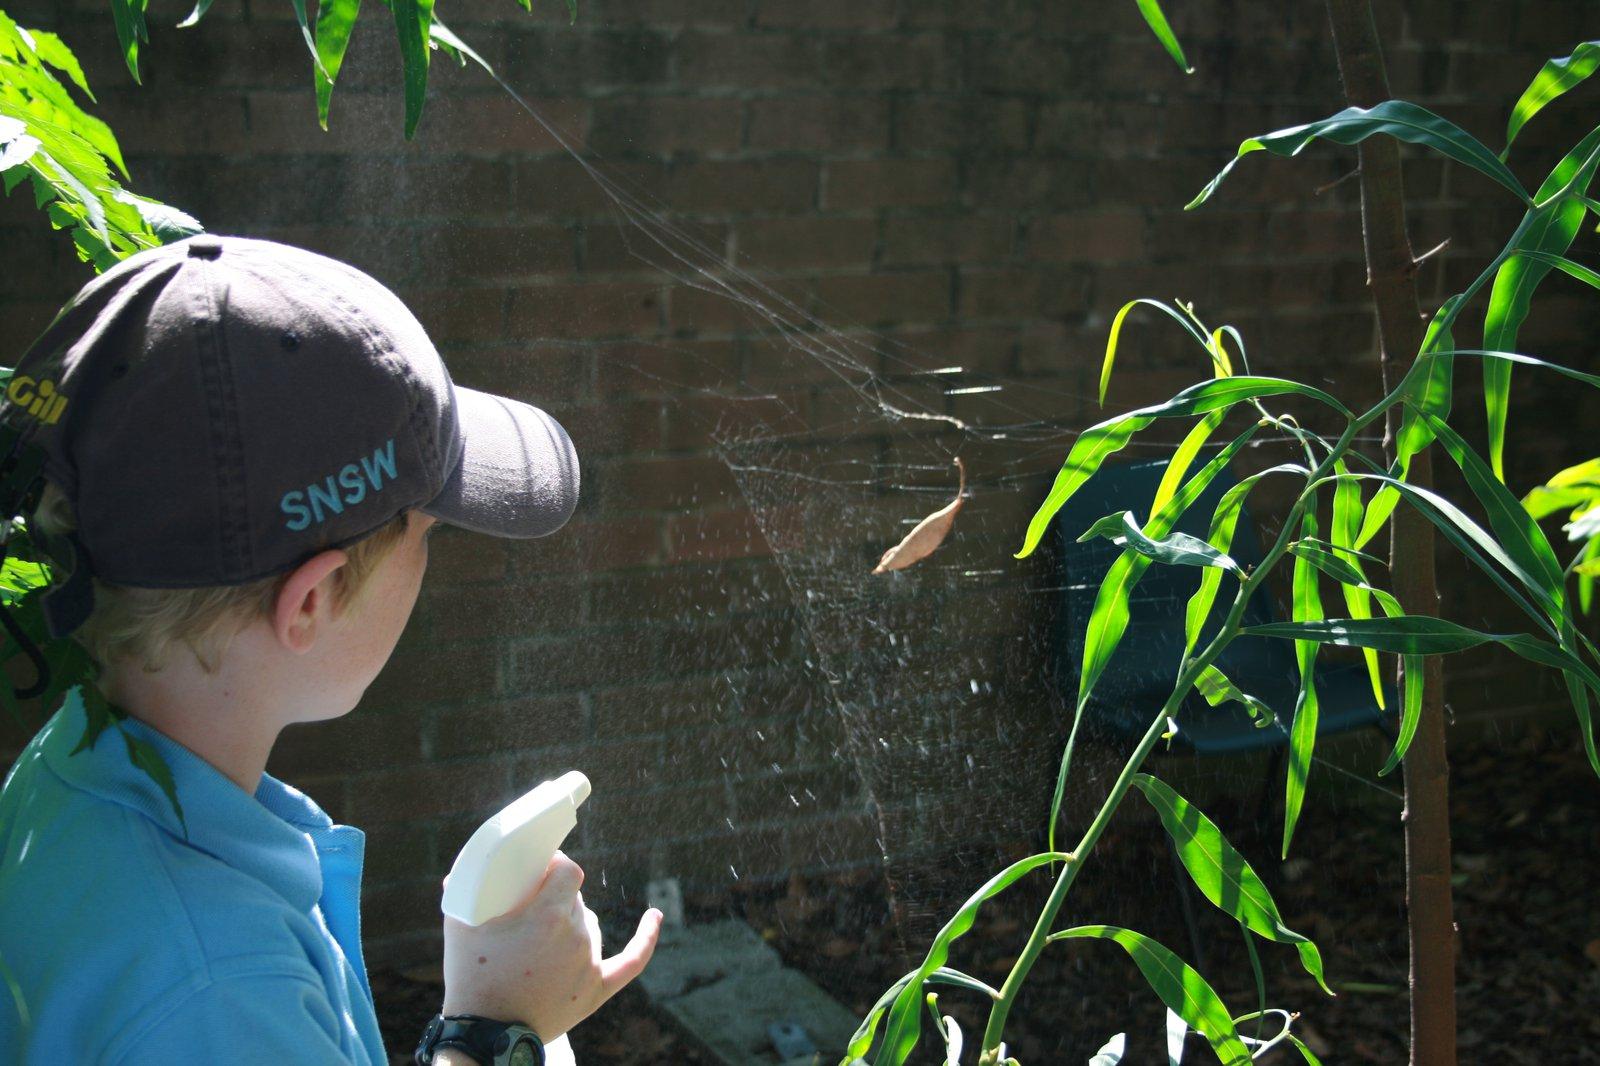 spraying leaf curl spider in Web2spider workshop spraying a leaf curl spider web